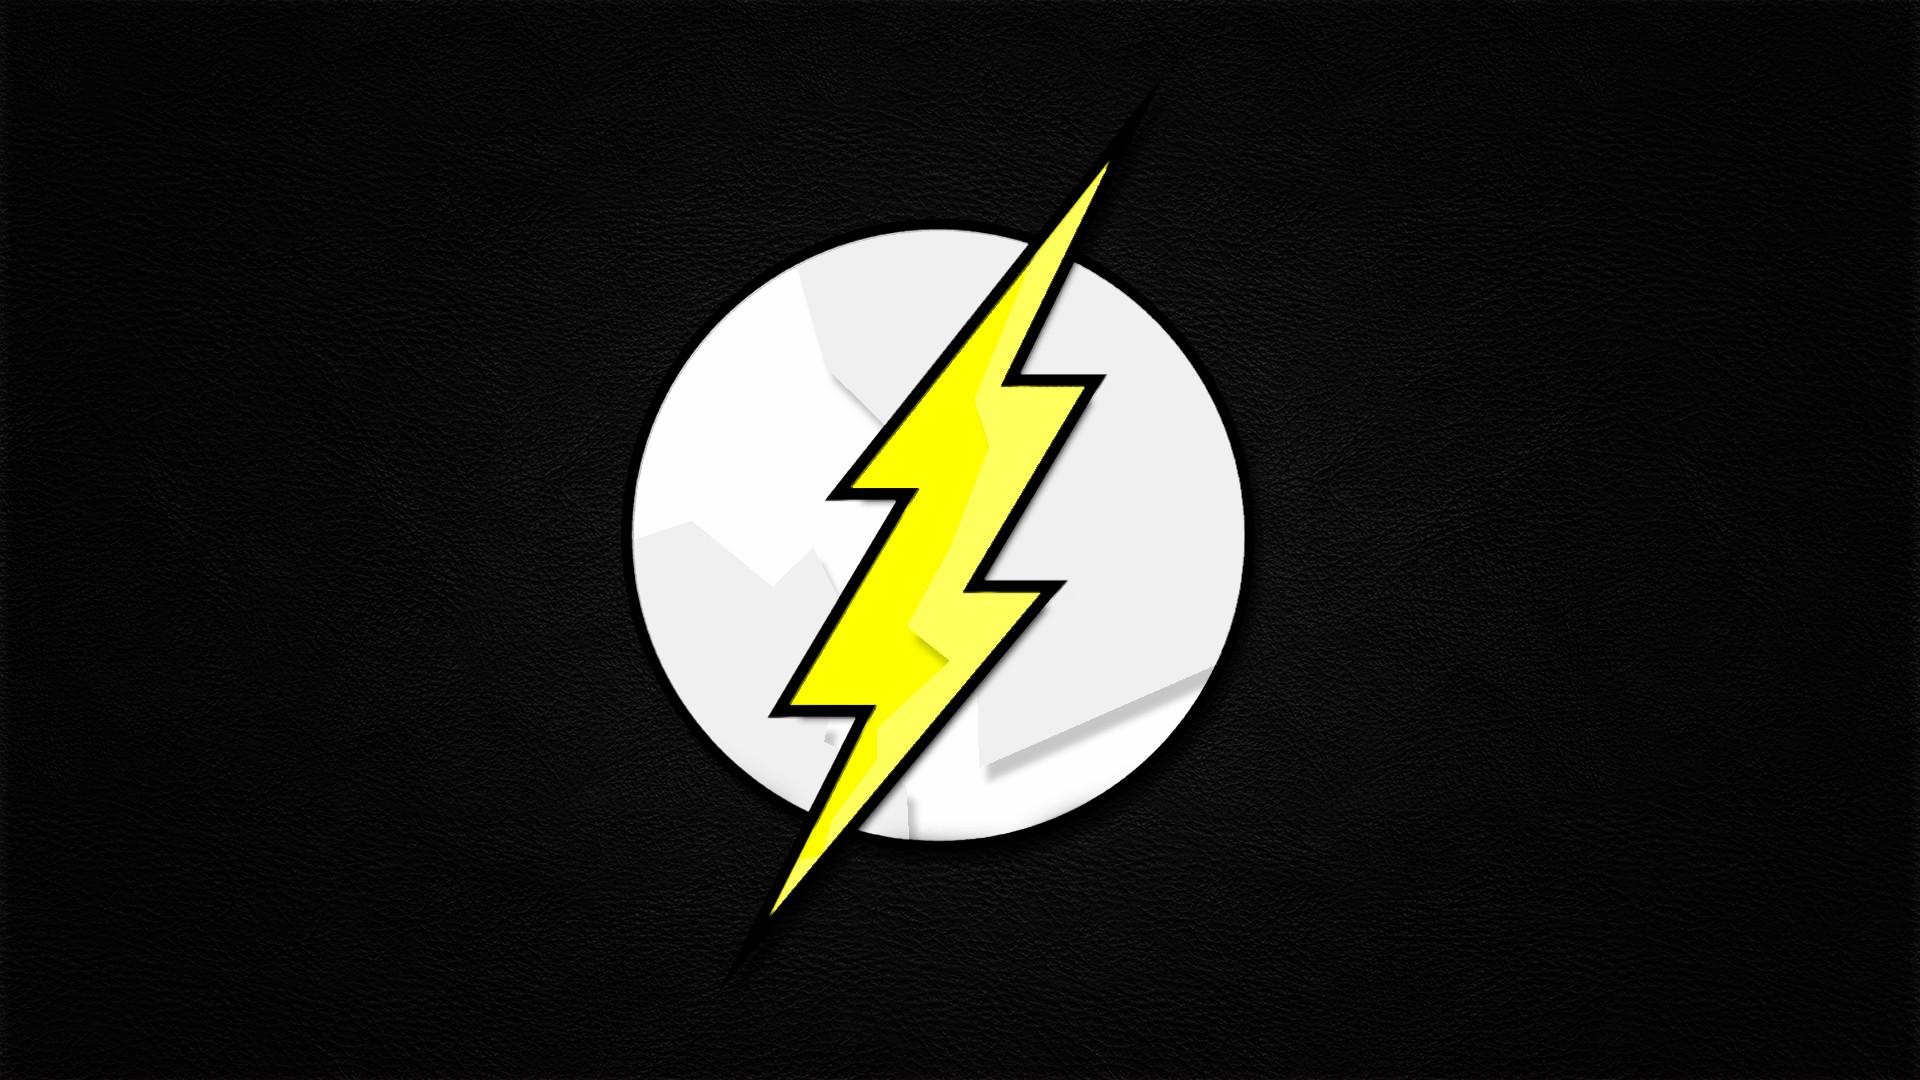 Comicsics The Flash logos Flash superhero wallpaper background 1920x1080